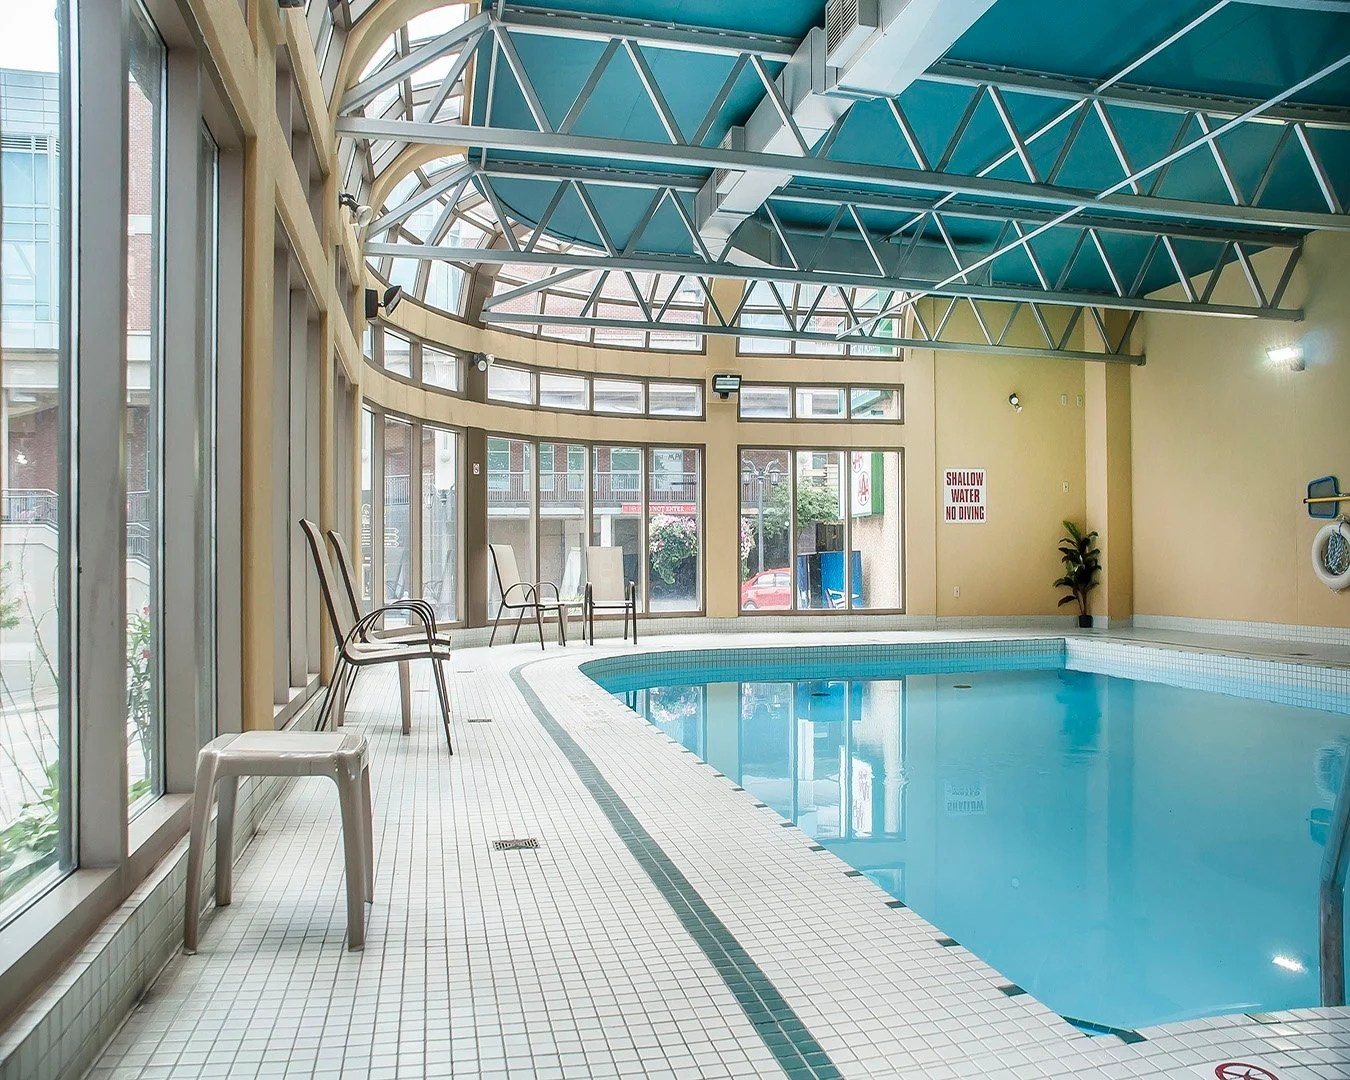 Quality Fallsview Cascade Hotel Where To Stay Niagara Falls Canada